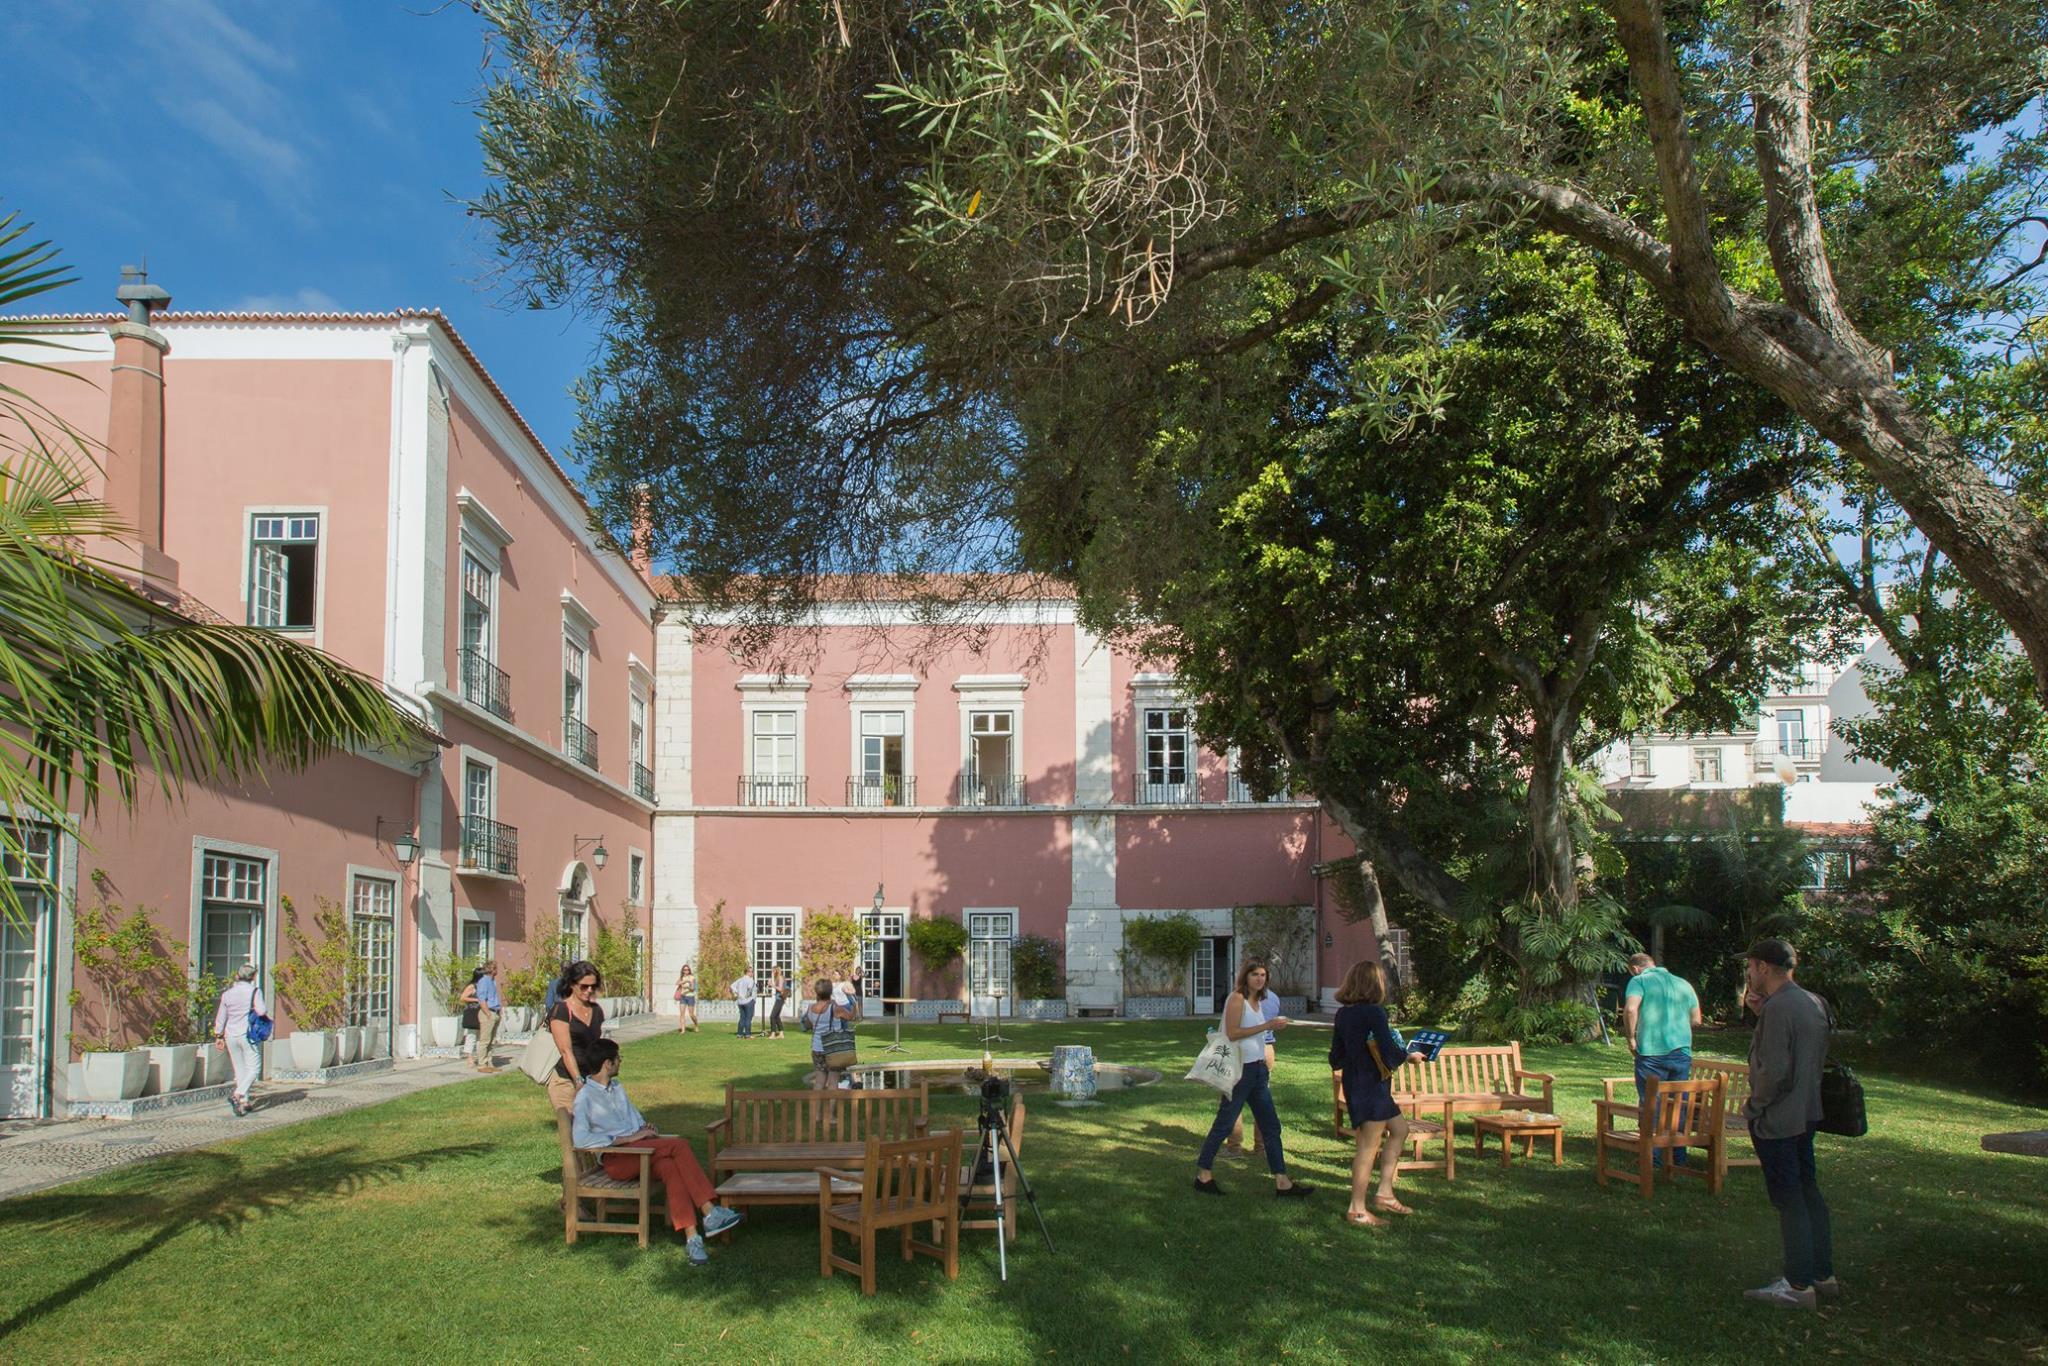 entreprendre au portugal r cit d 39 une journ e l 39 ambassade de france. Black Bedroom Furniture Sets. Home Design Ideas